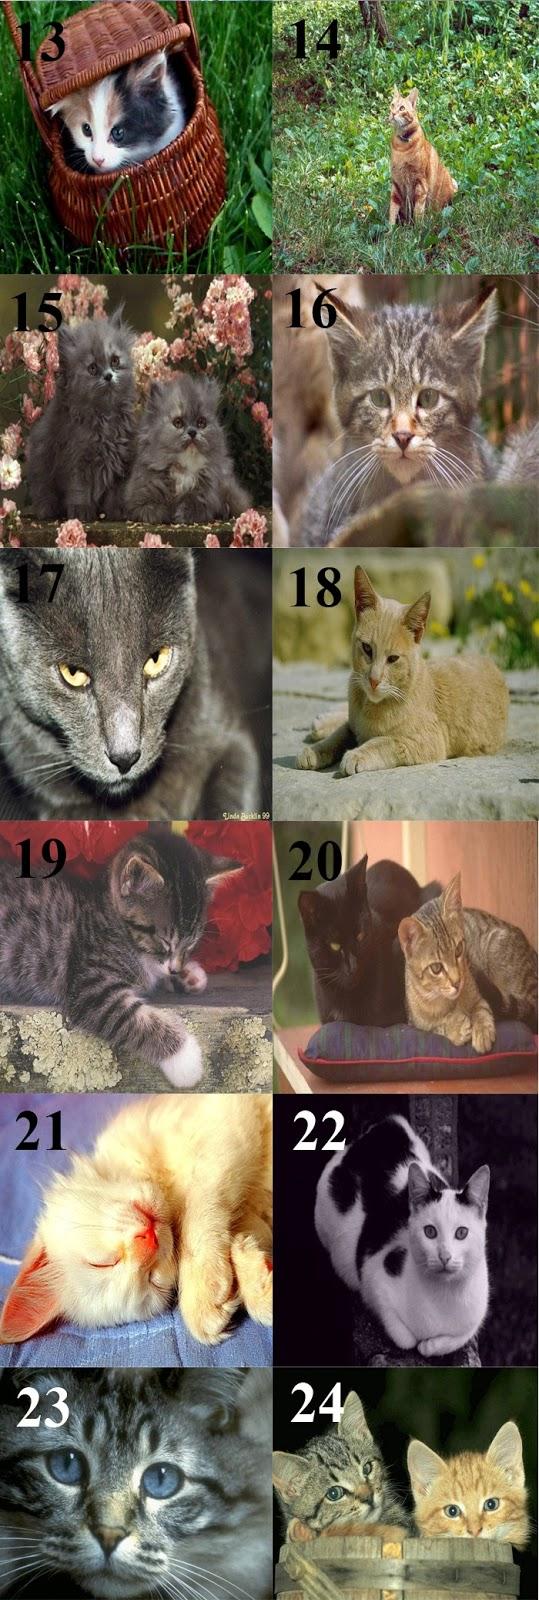 Download Gambar Kucing Lucu Imut 13-24